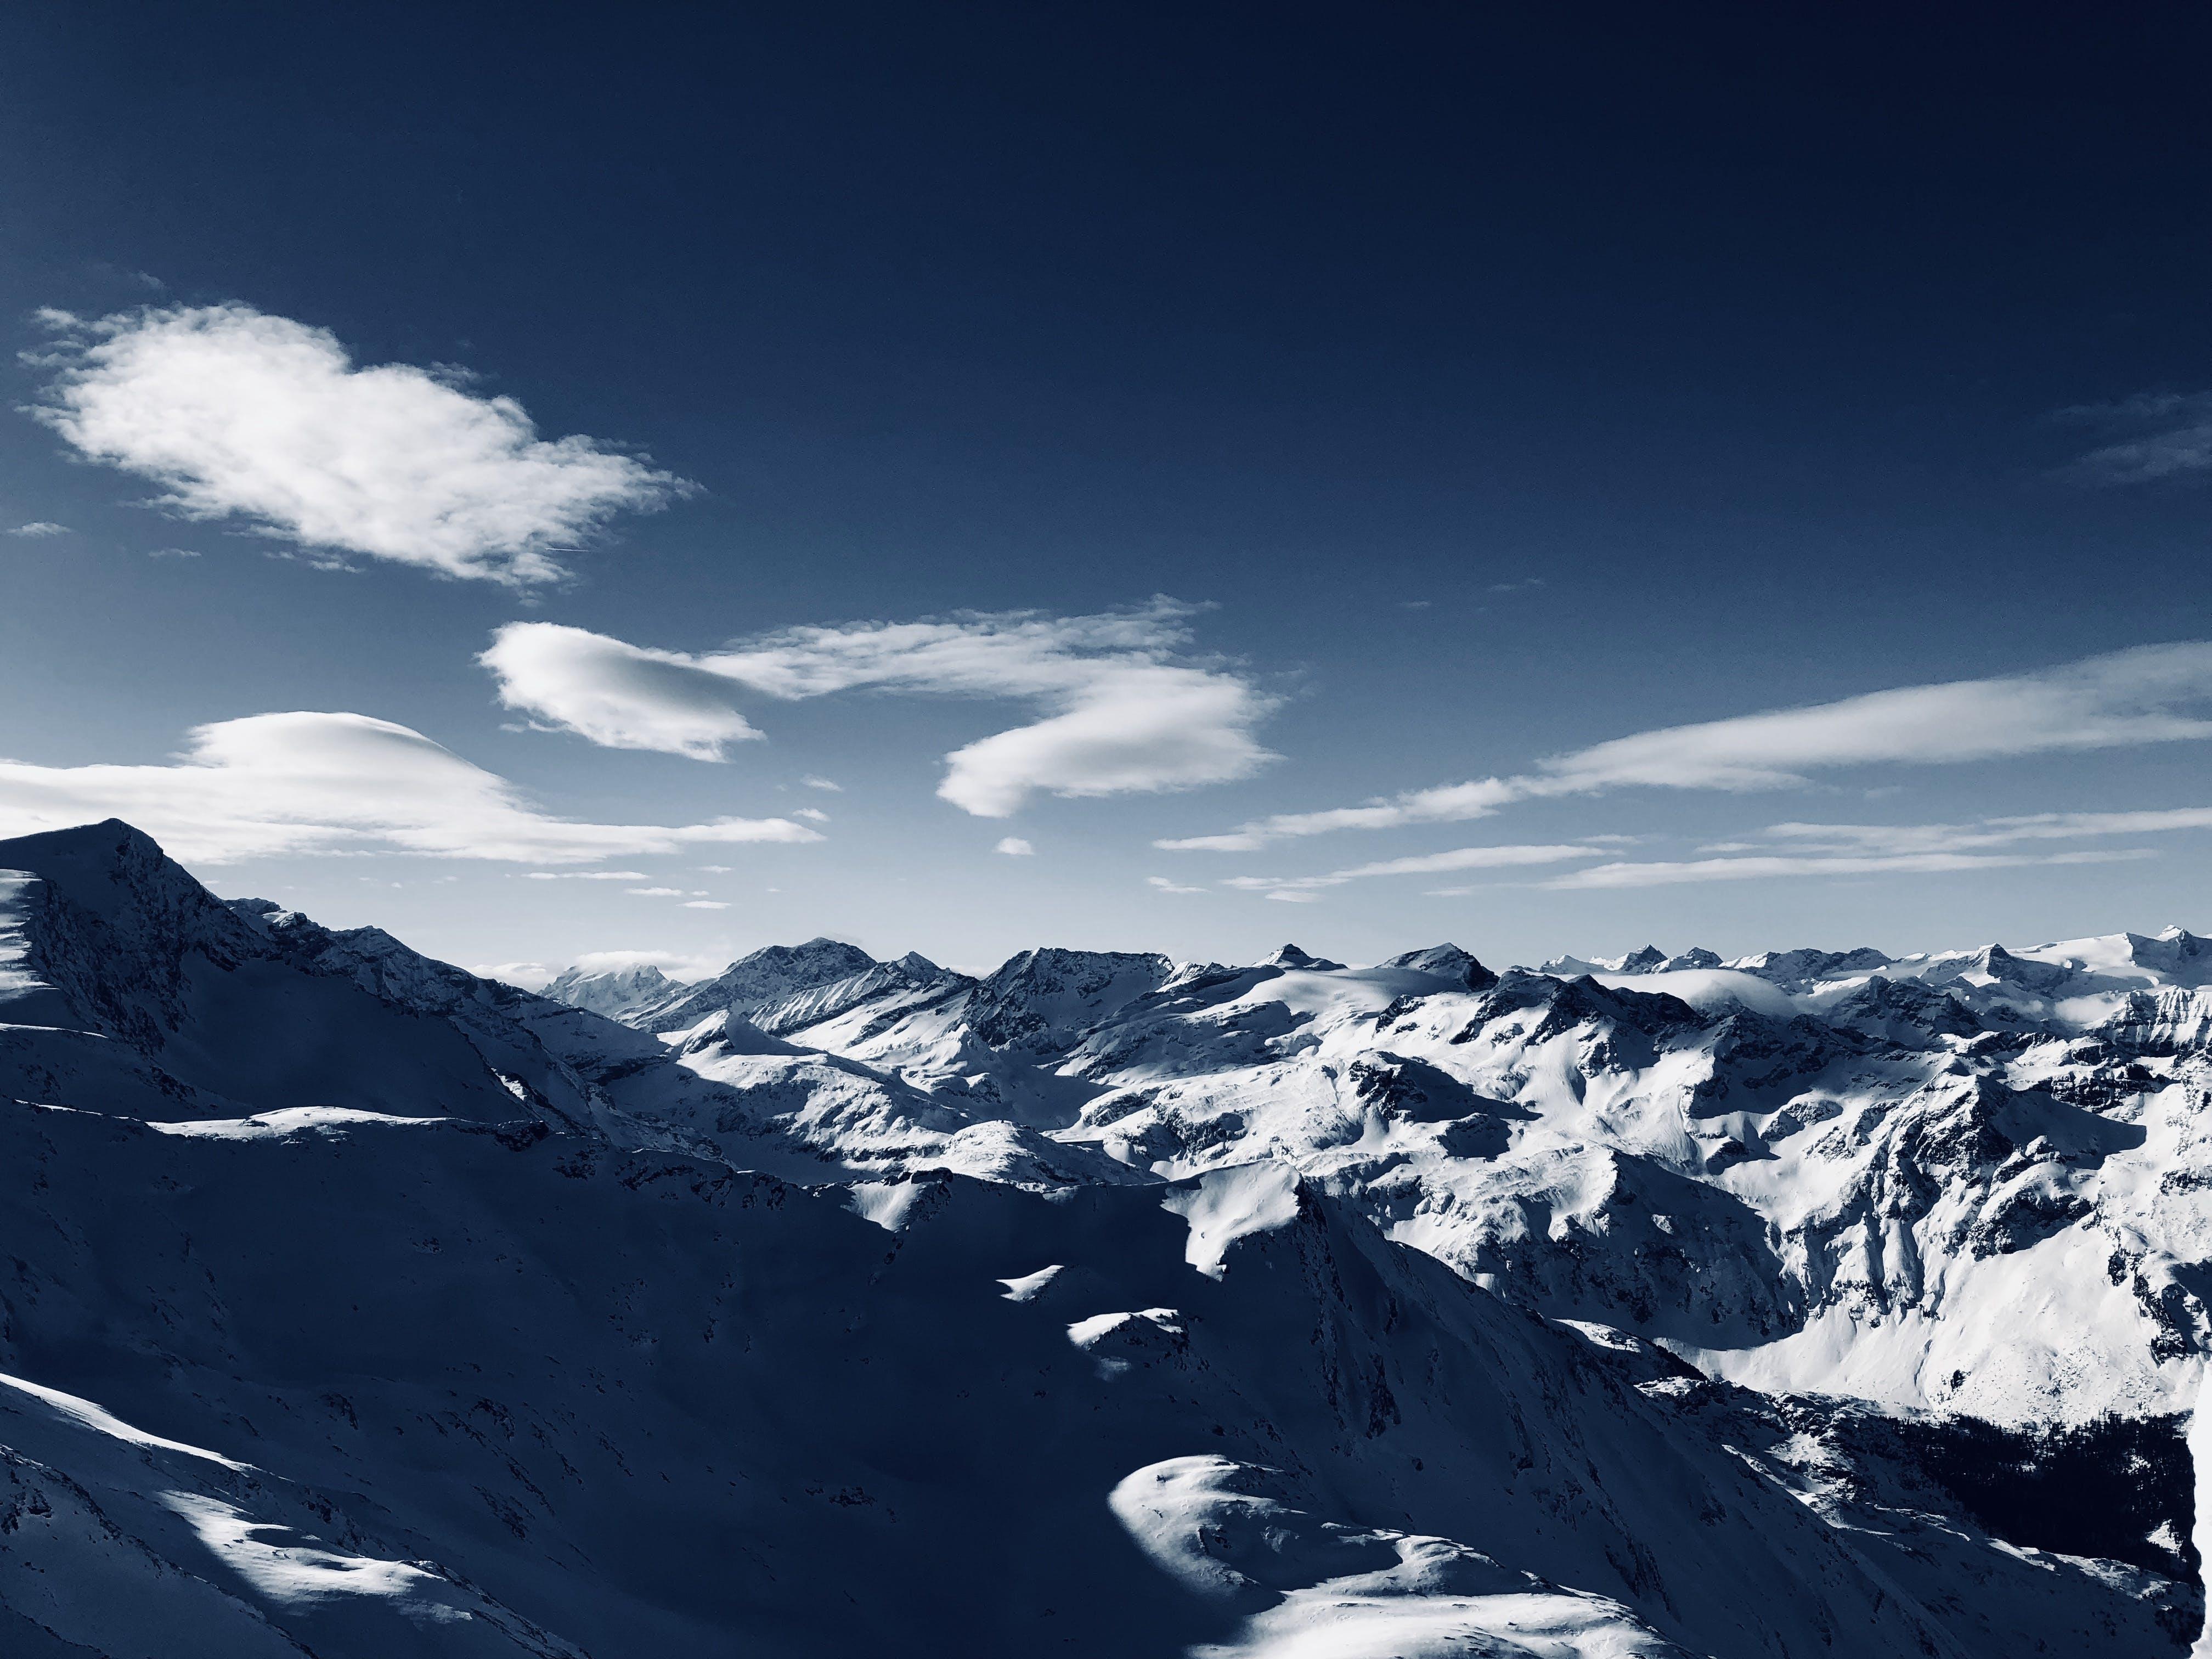 High-angle Photo of Mountain